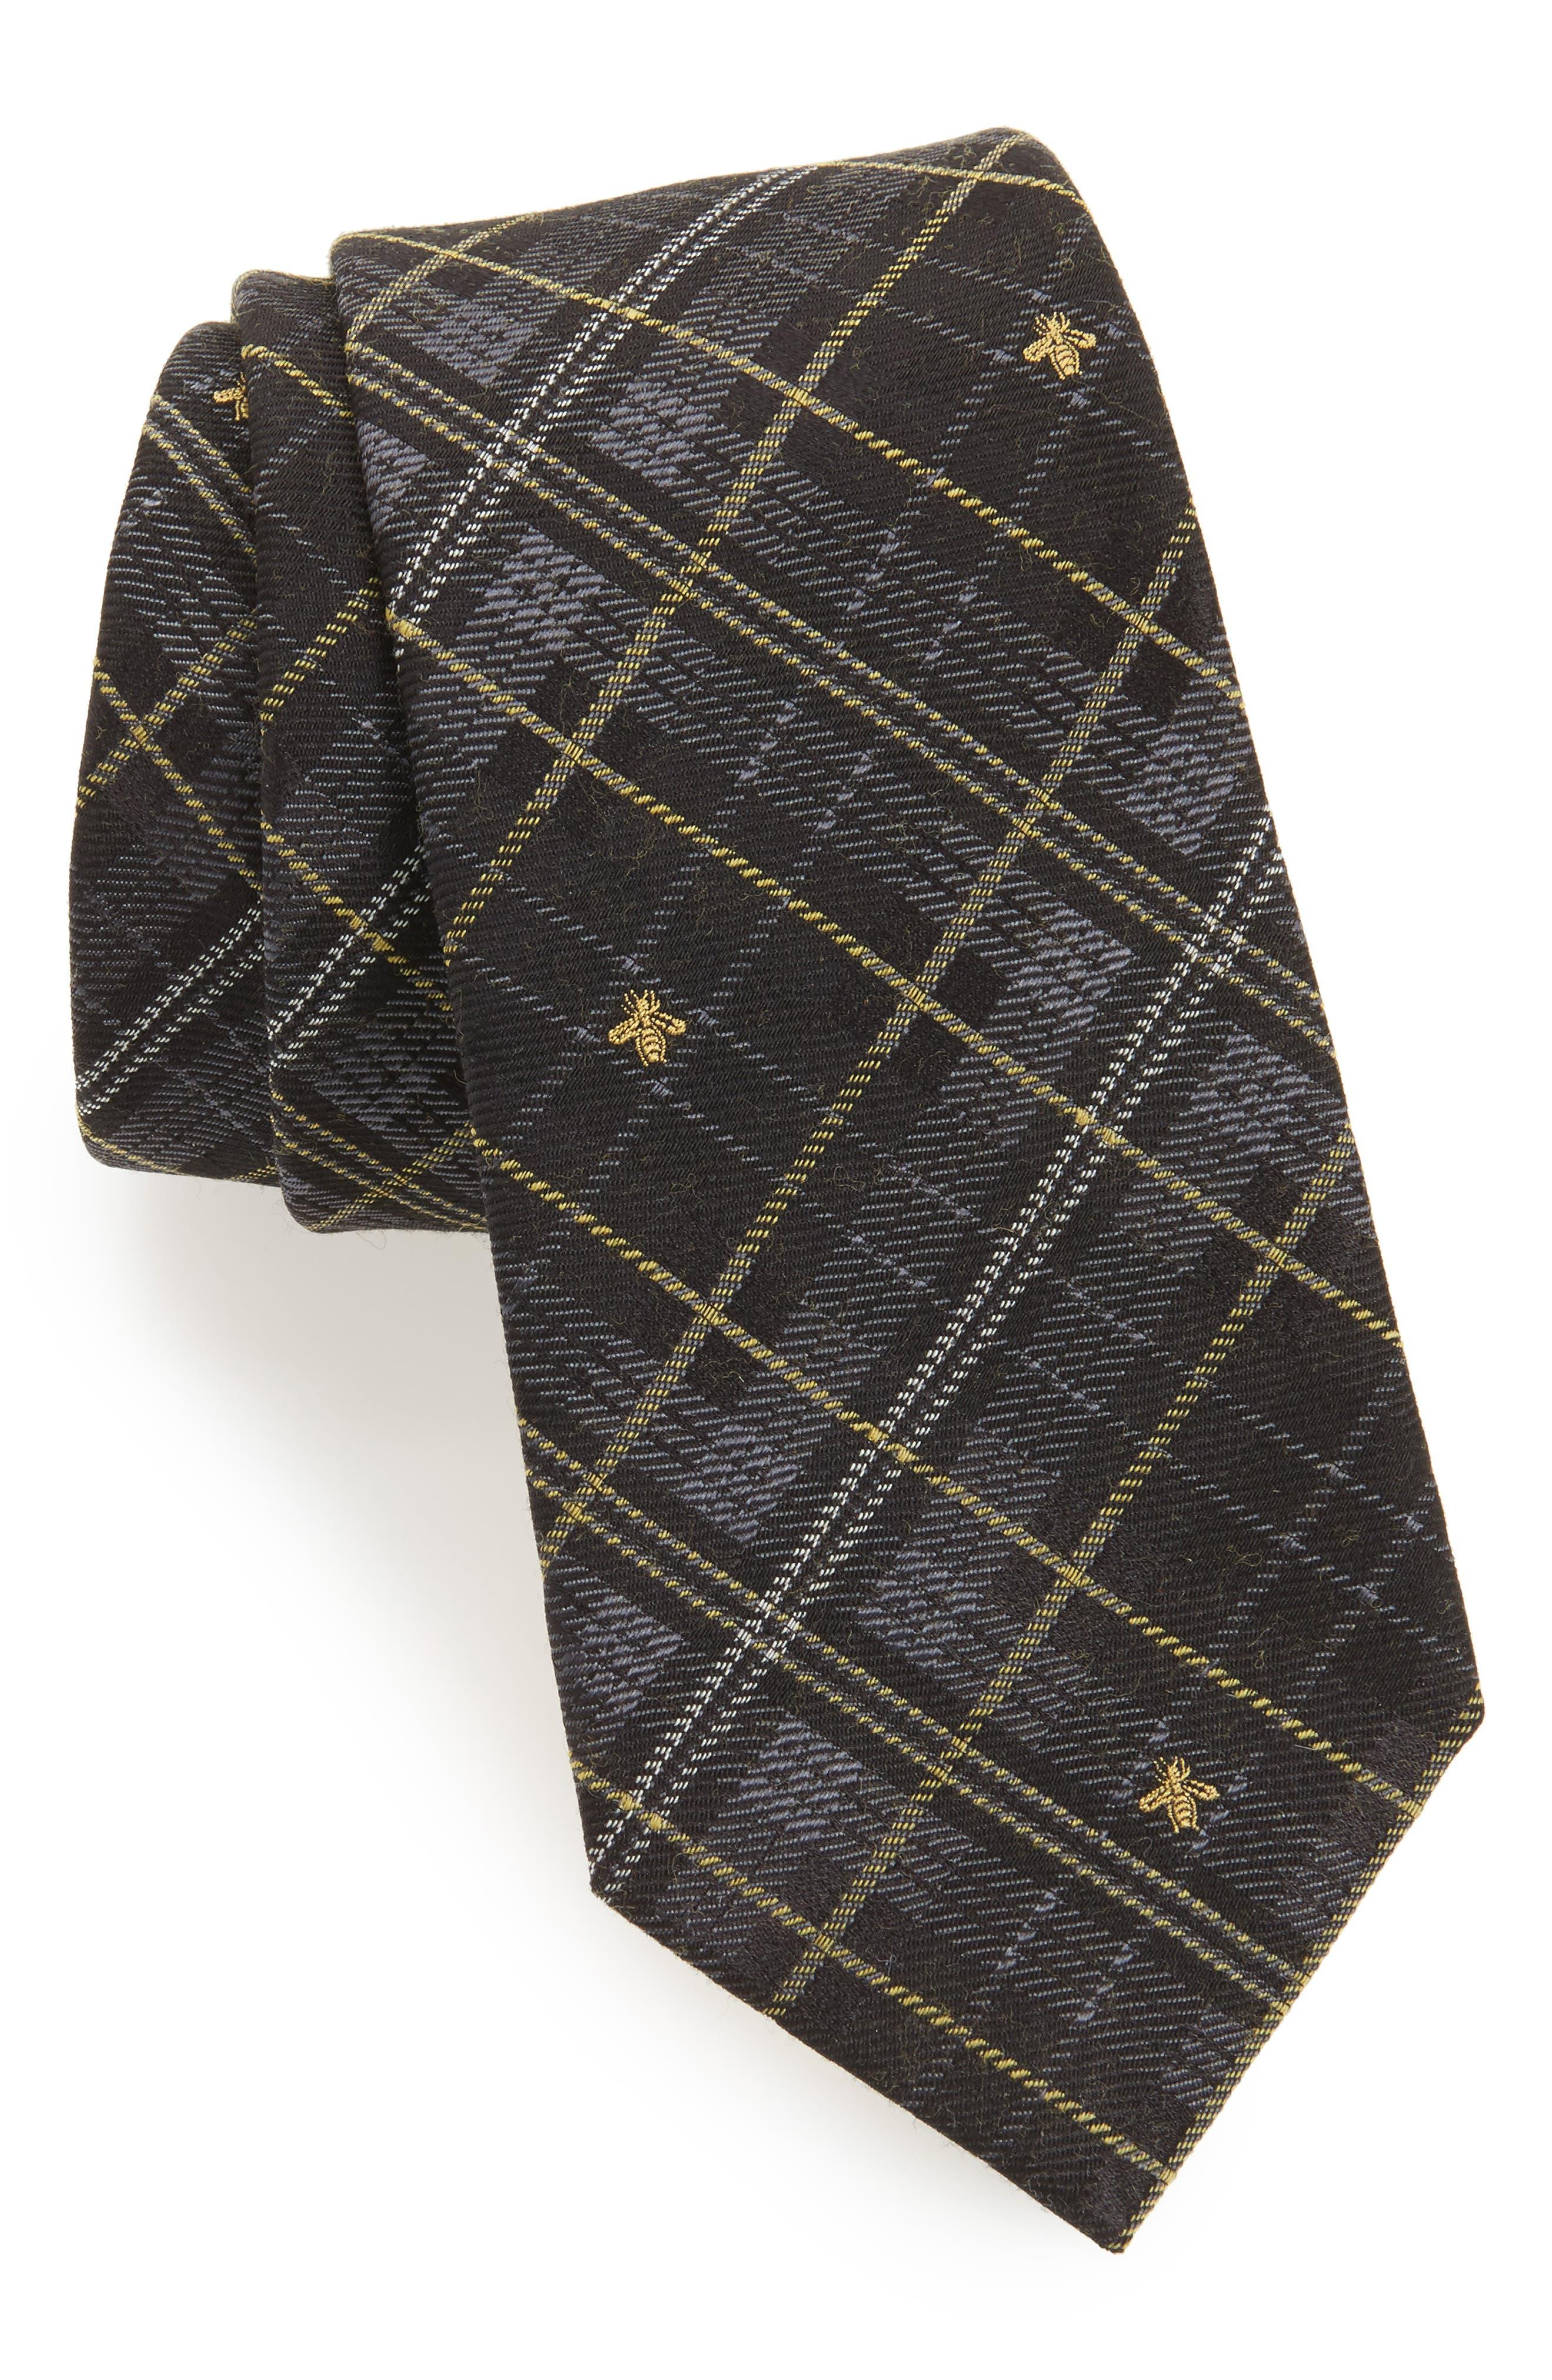 Main Image - Gucci Kilt Bee Plaid Jacquard Tie